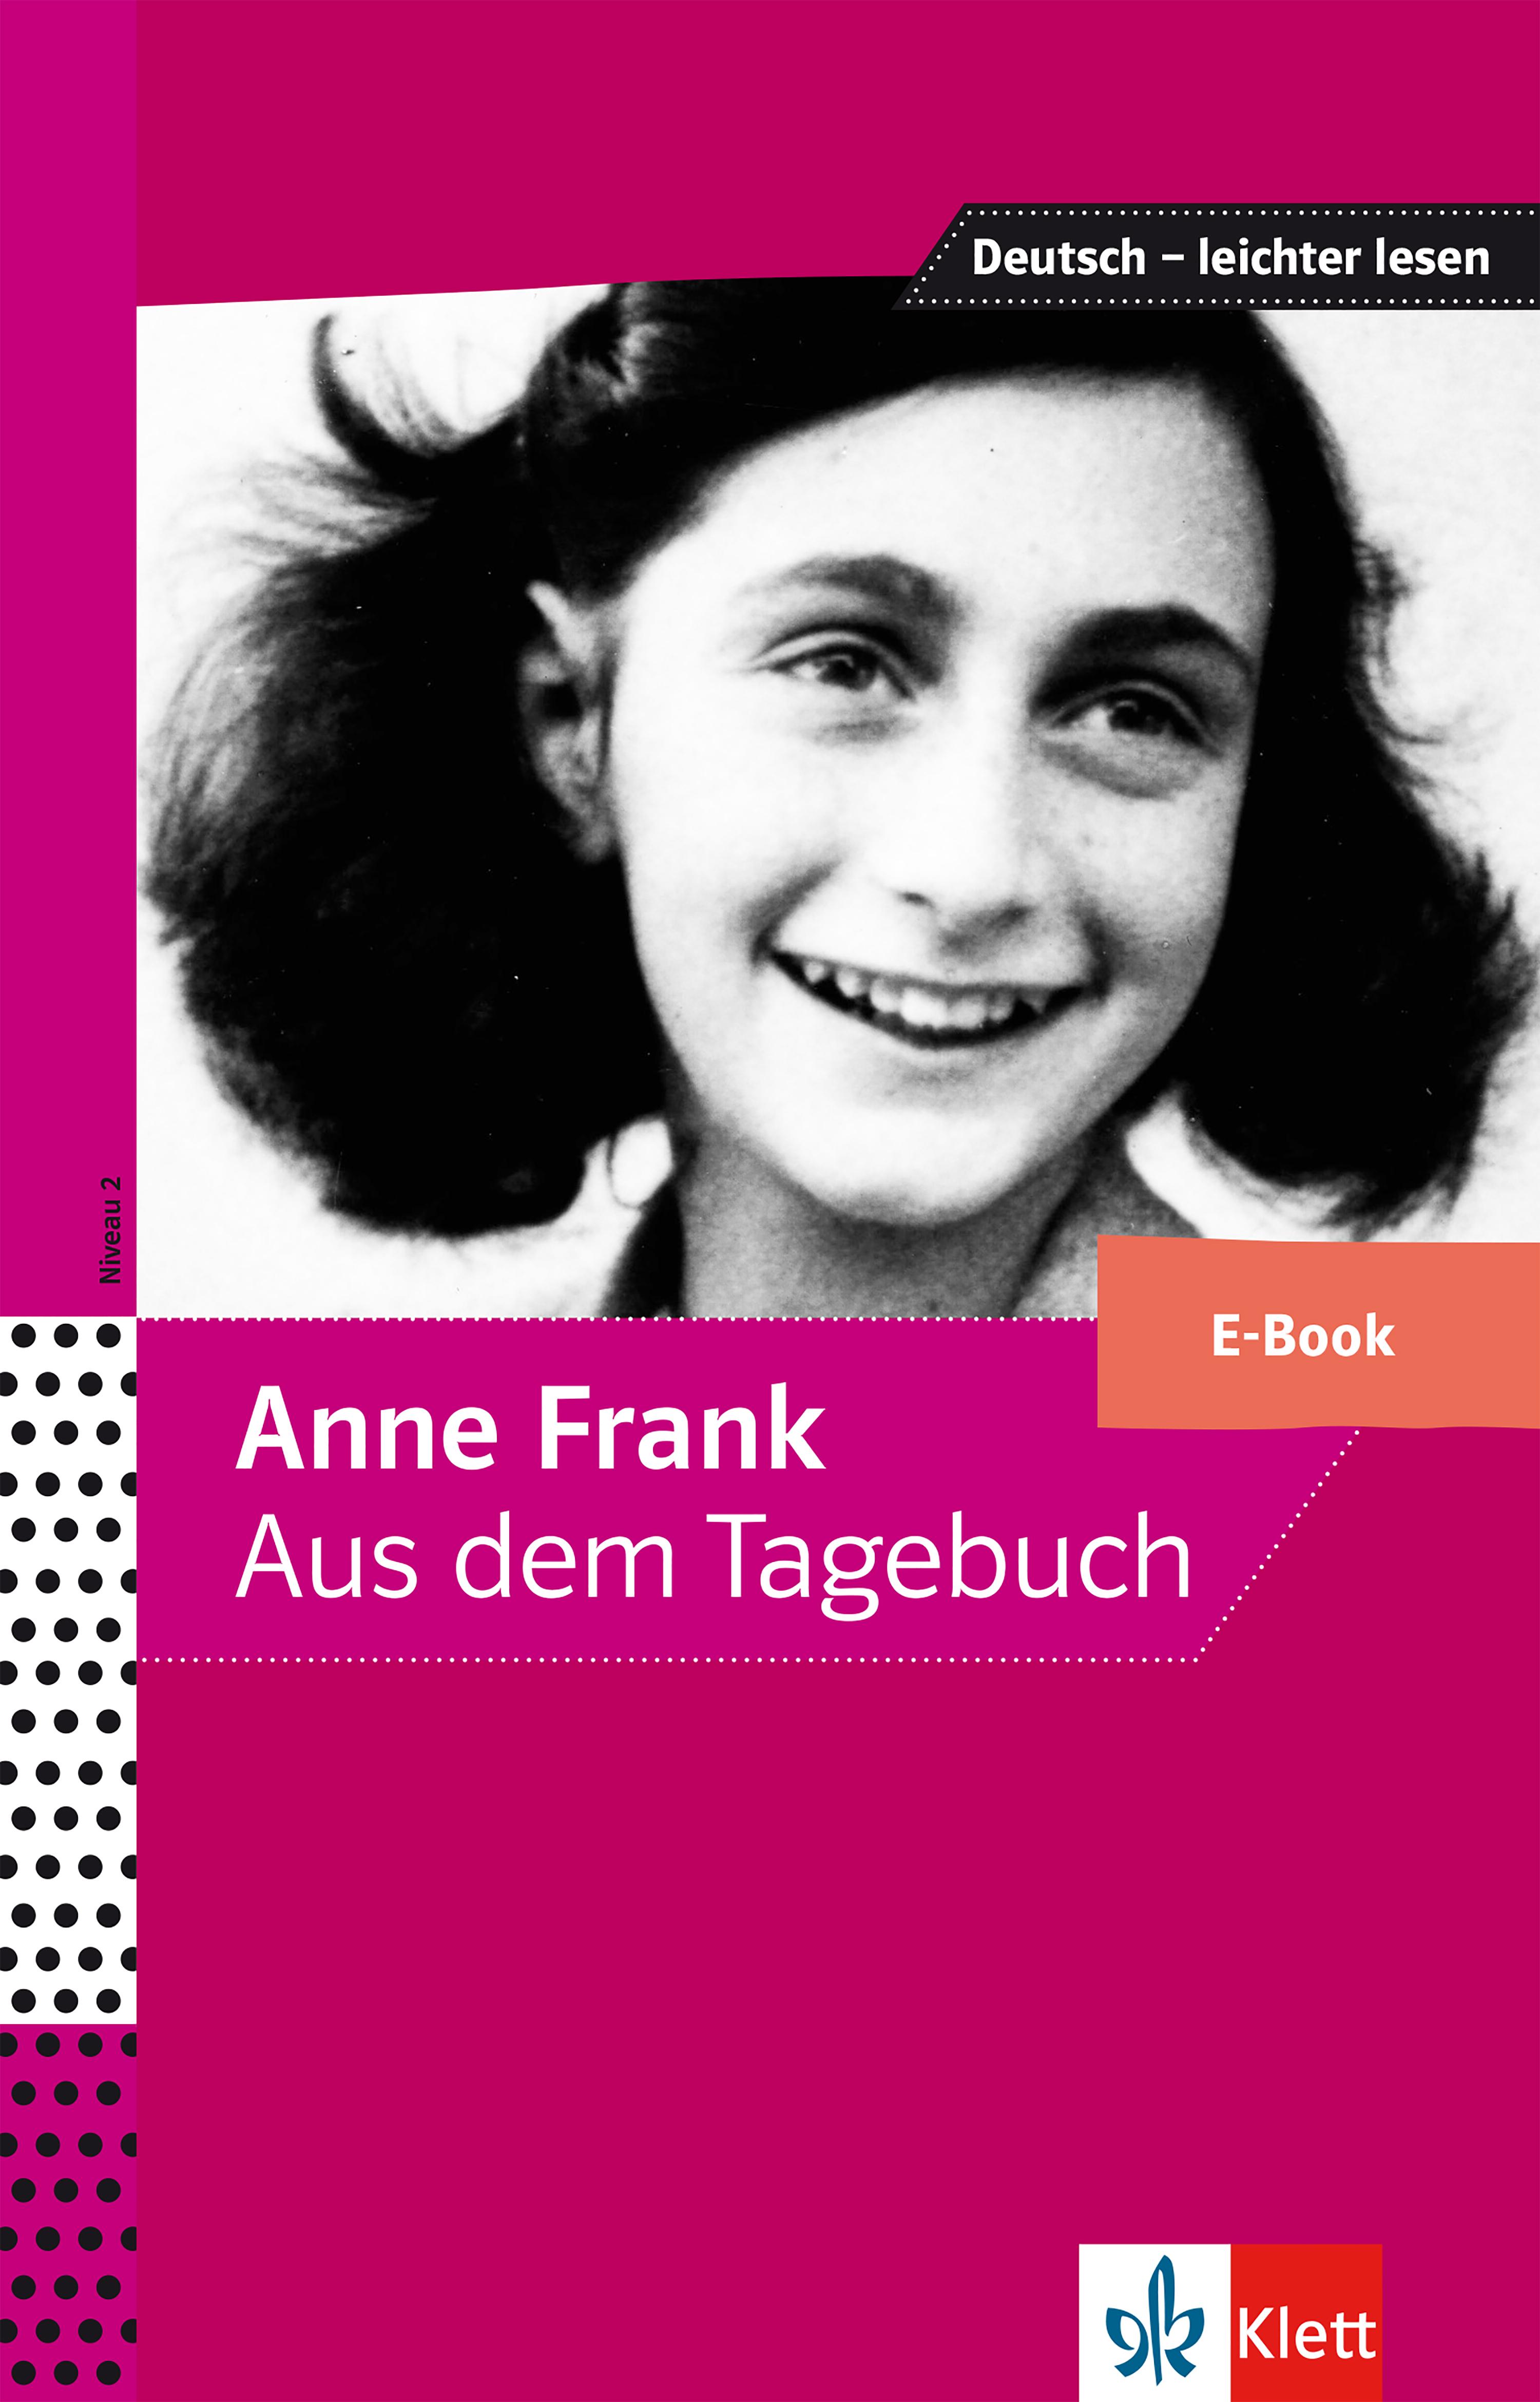 Anne Frank Anne Frank - Aus dem Tagebuch толстовка frank q